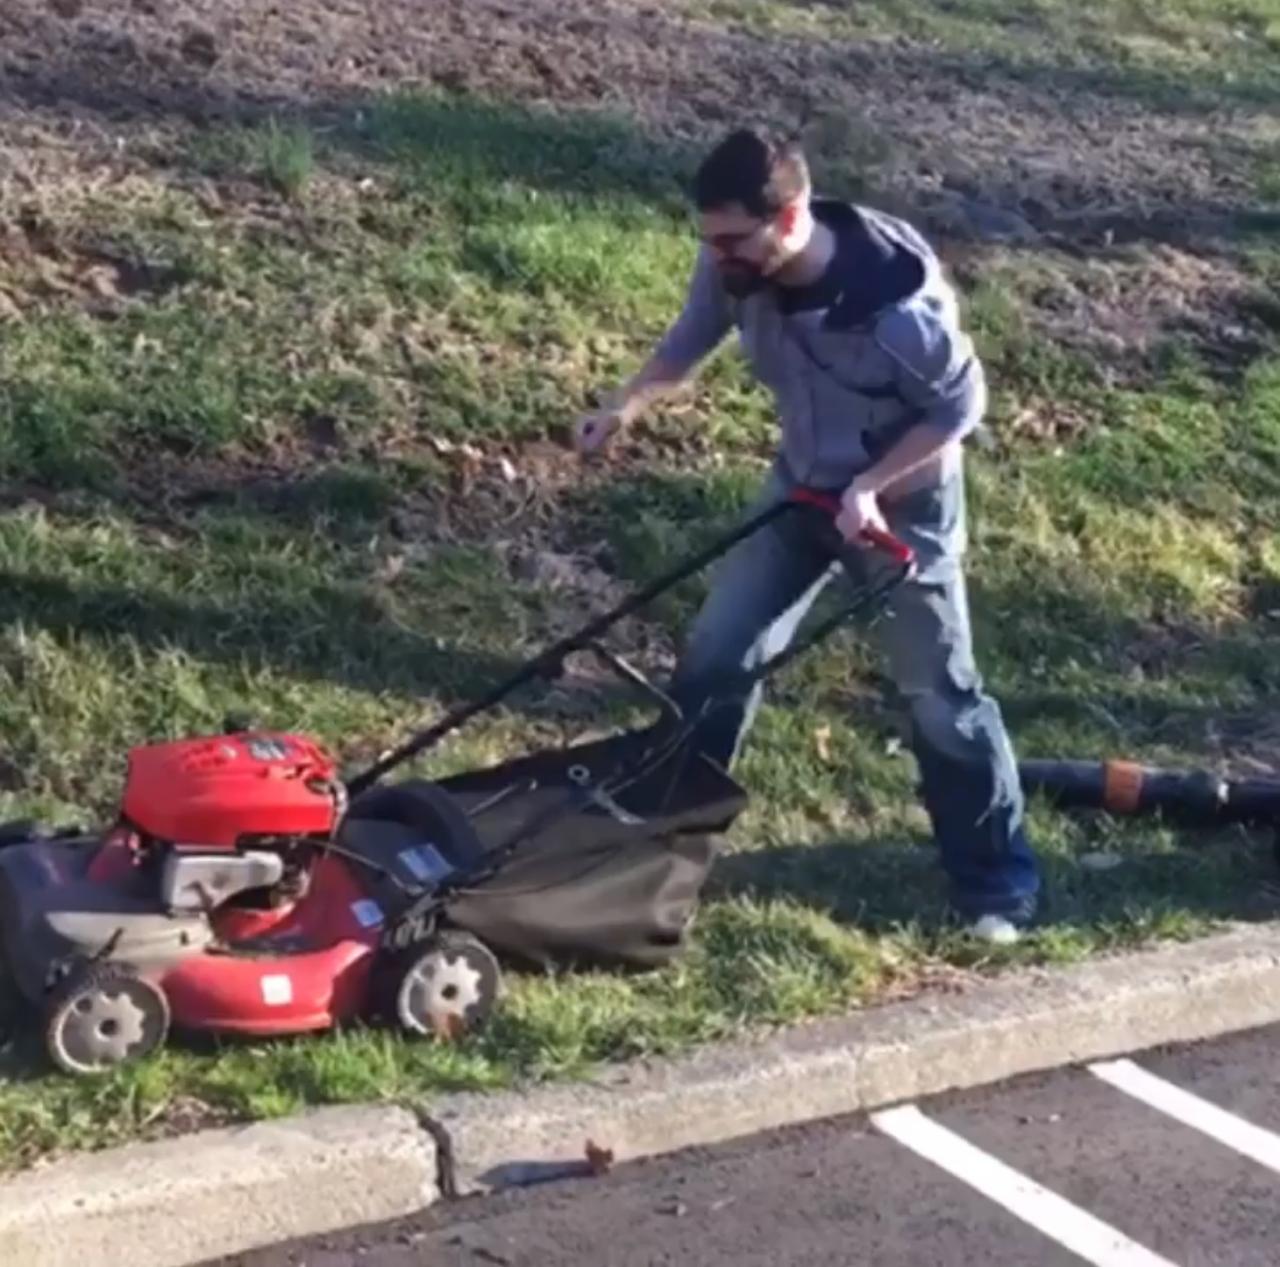 Monday, April 1: Phil STILL Hasn't Mowed A Lawn! Plus Court Audio And Tournament Talk